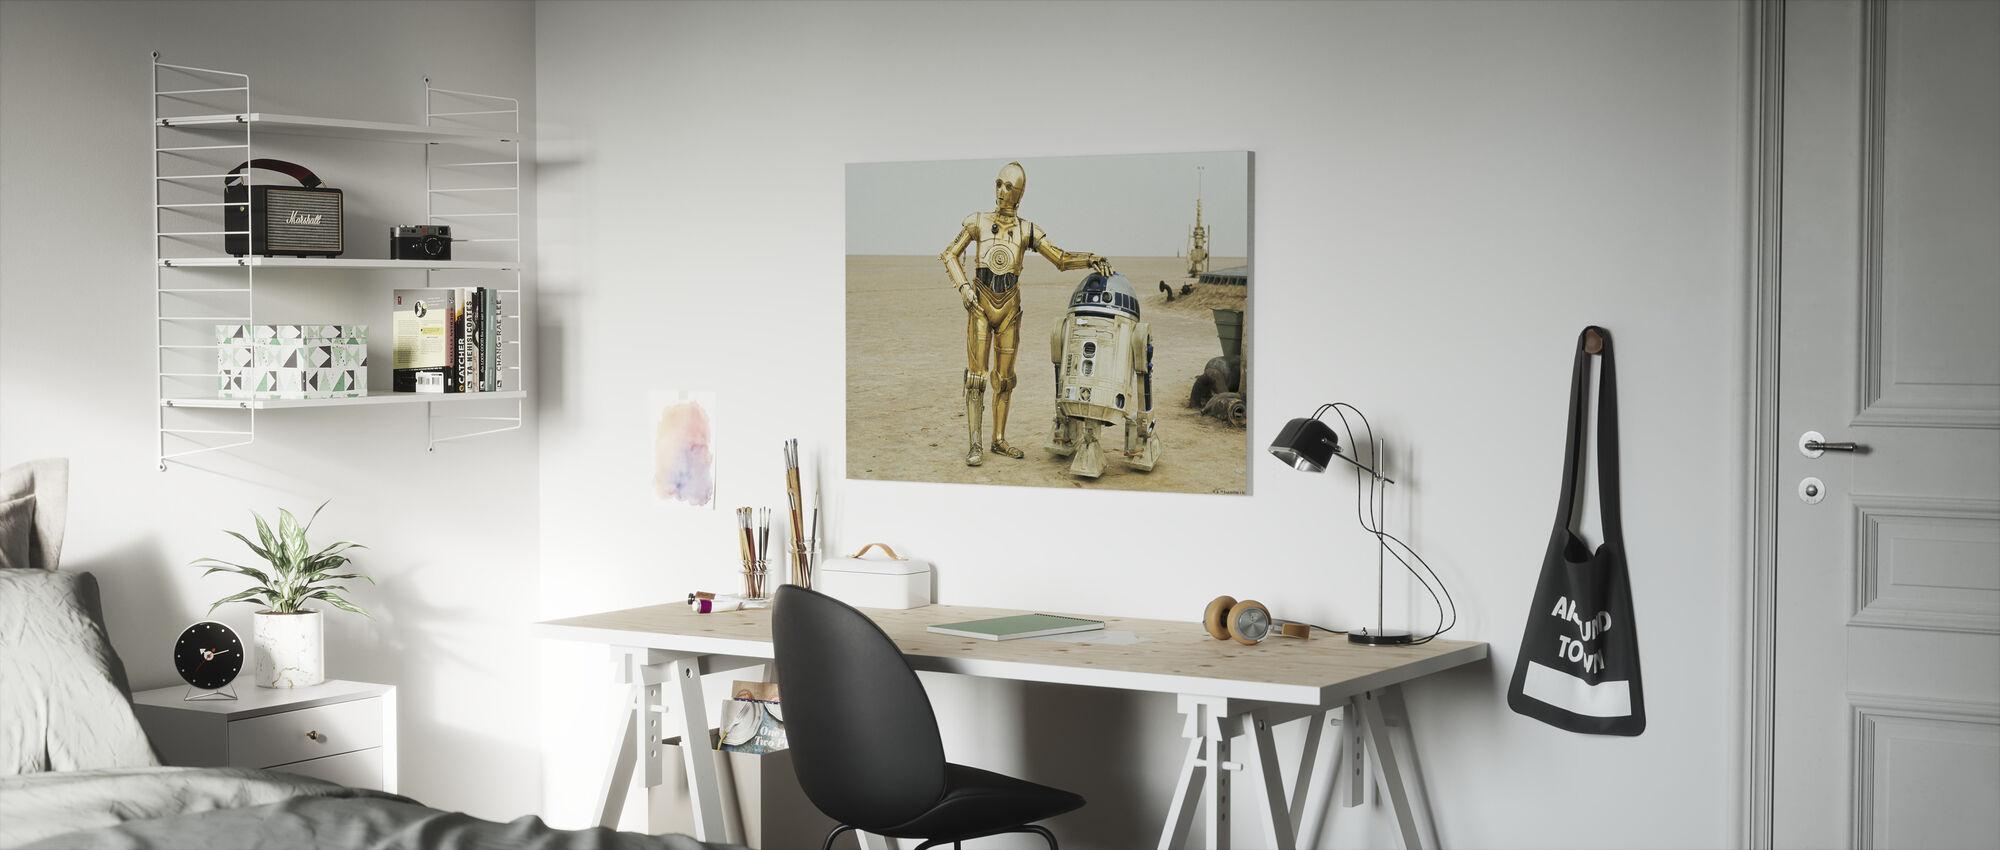 Star Wars - R2-D2 og C-3PO - Lerretsbilde - Barnerom